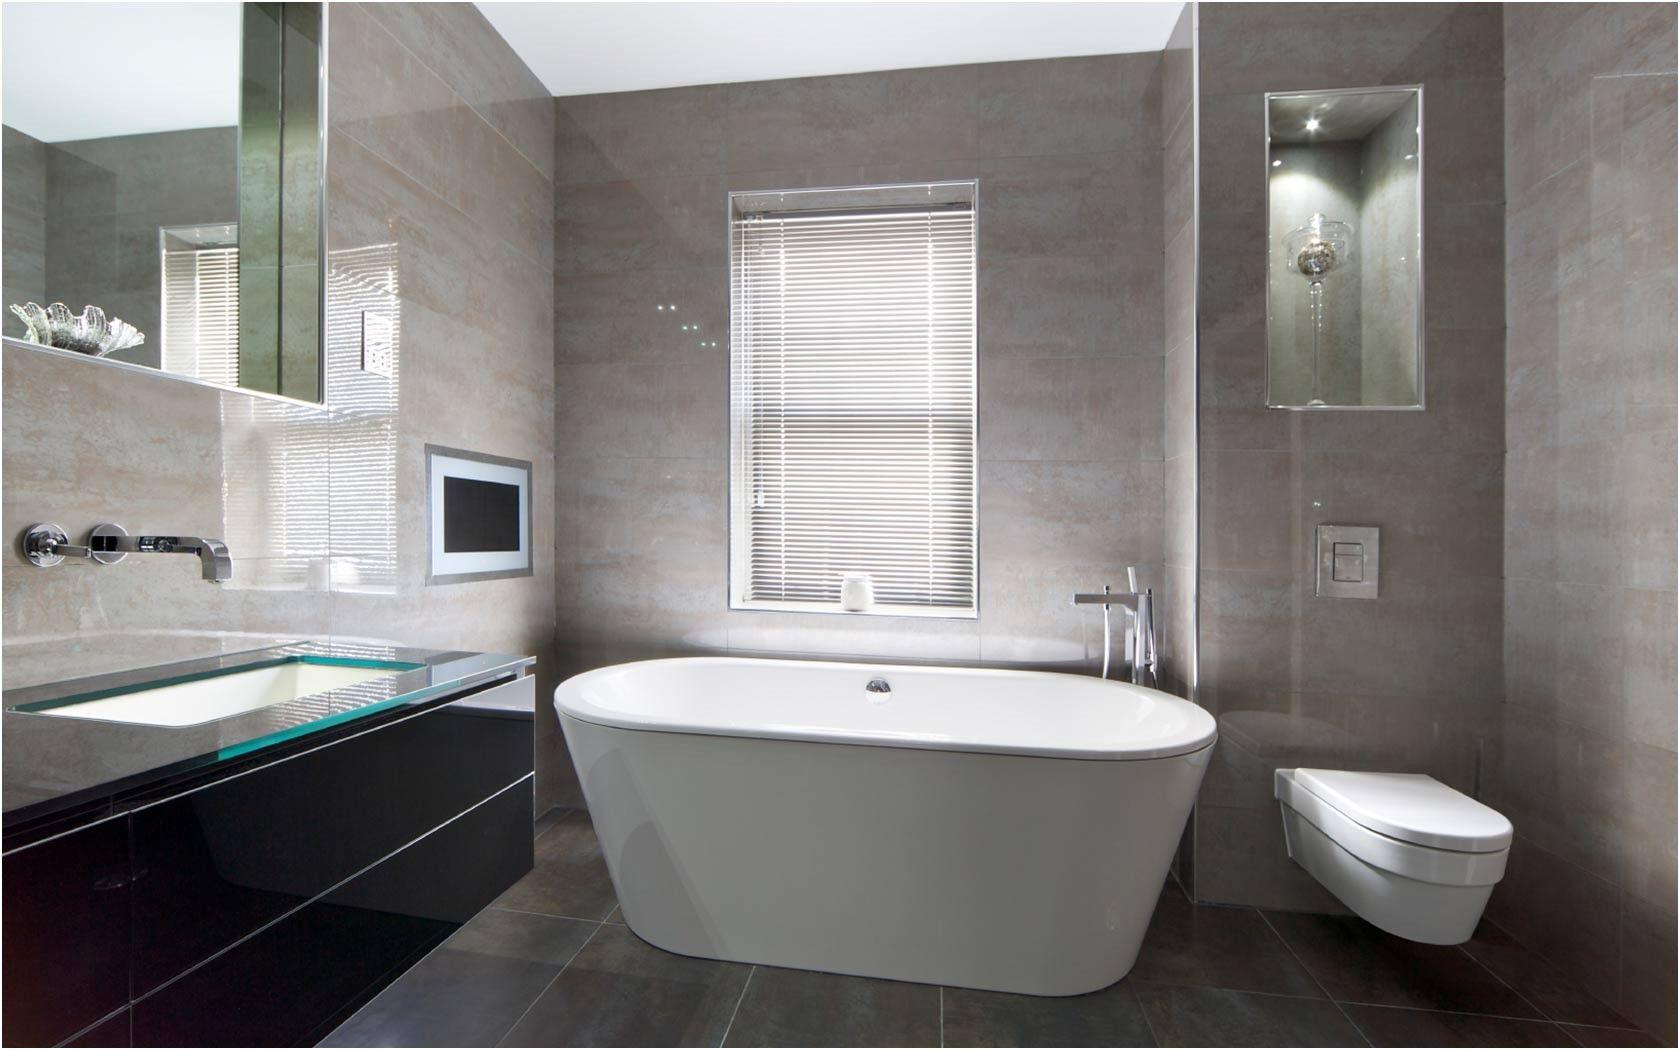 charles christian bathrooms luxury designer bathrooms london